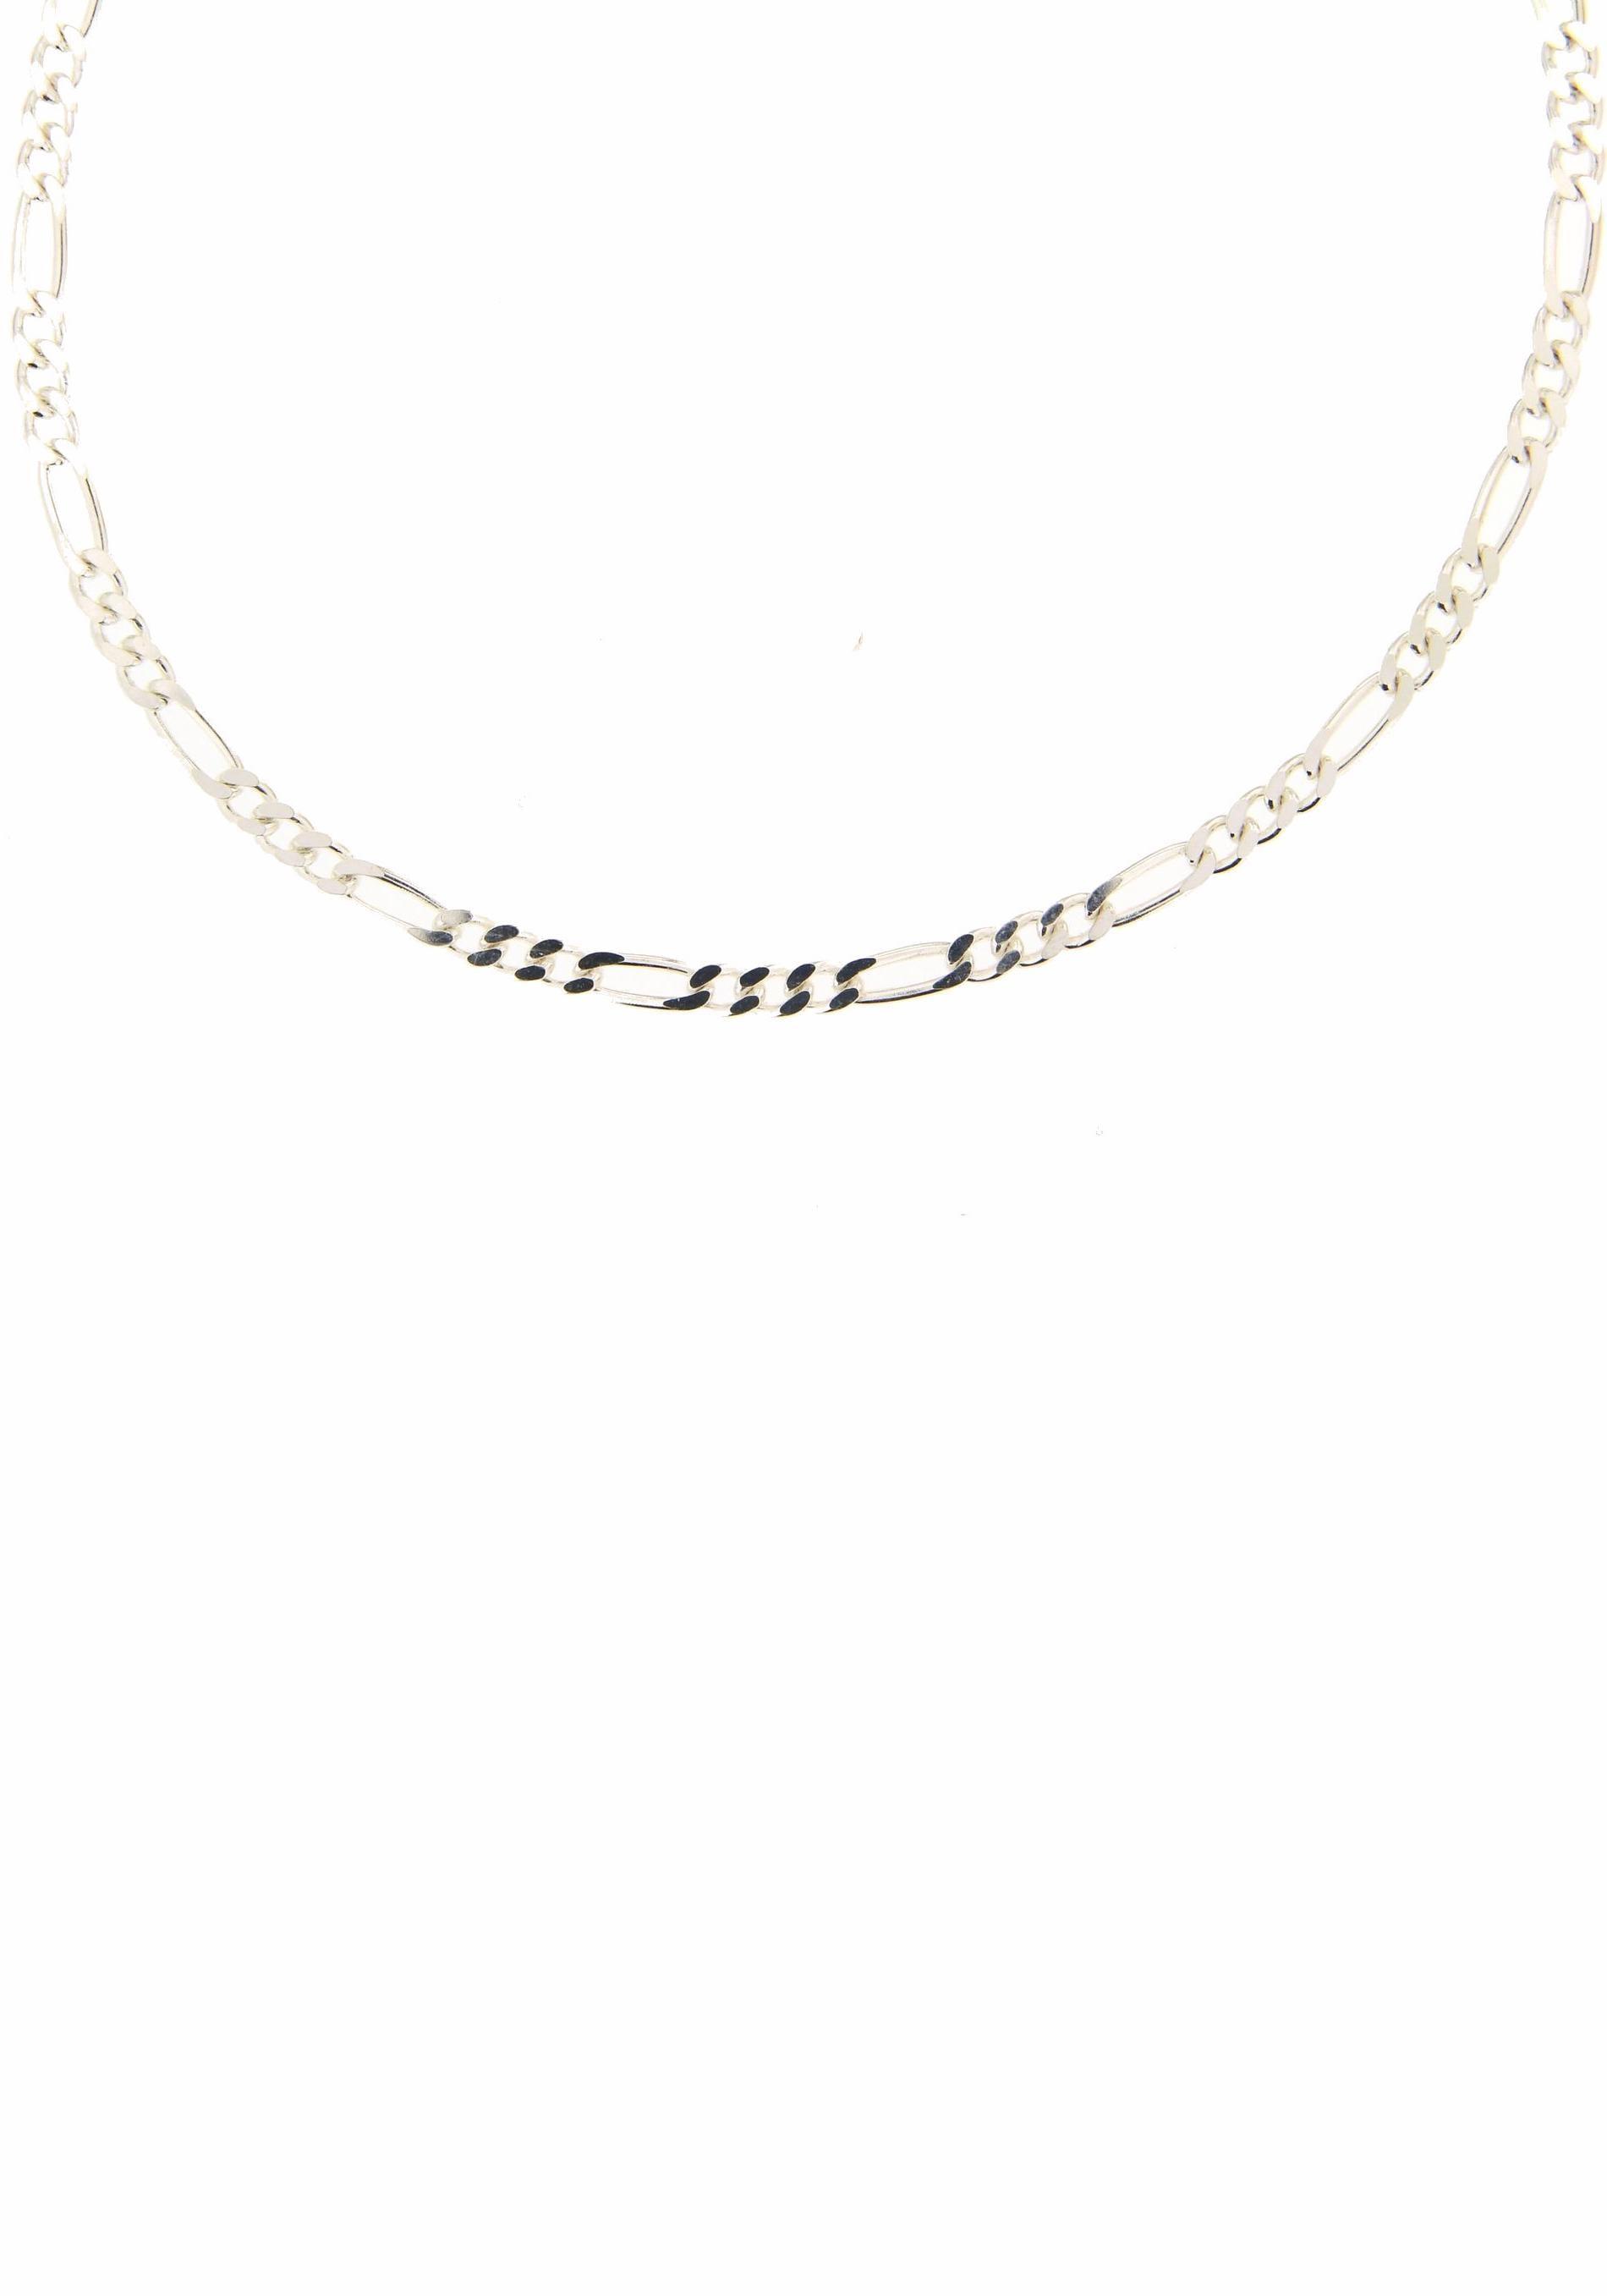 Firetti Silberkette »Figarokettengliederung 3:1, 2,8 mm breit, glanz, 2-fach diamantiert« | Schmuck | Firetti